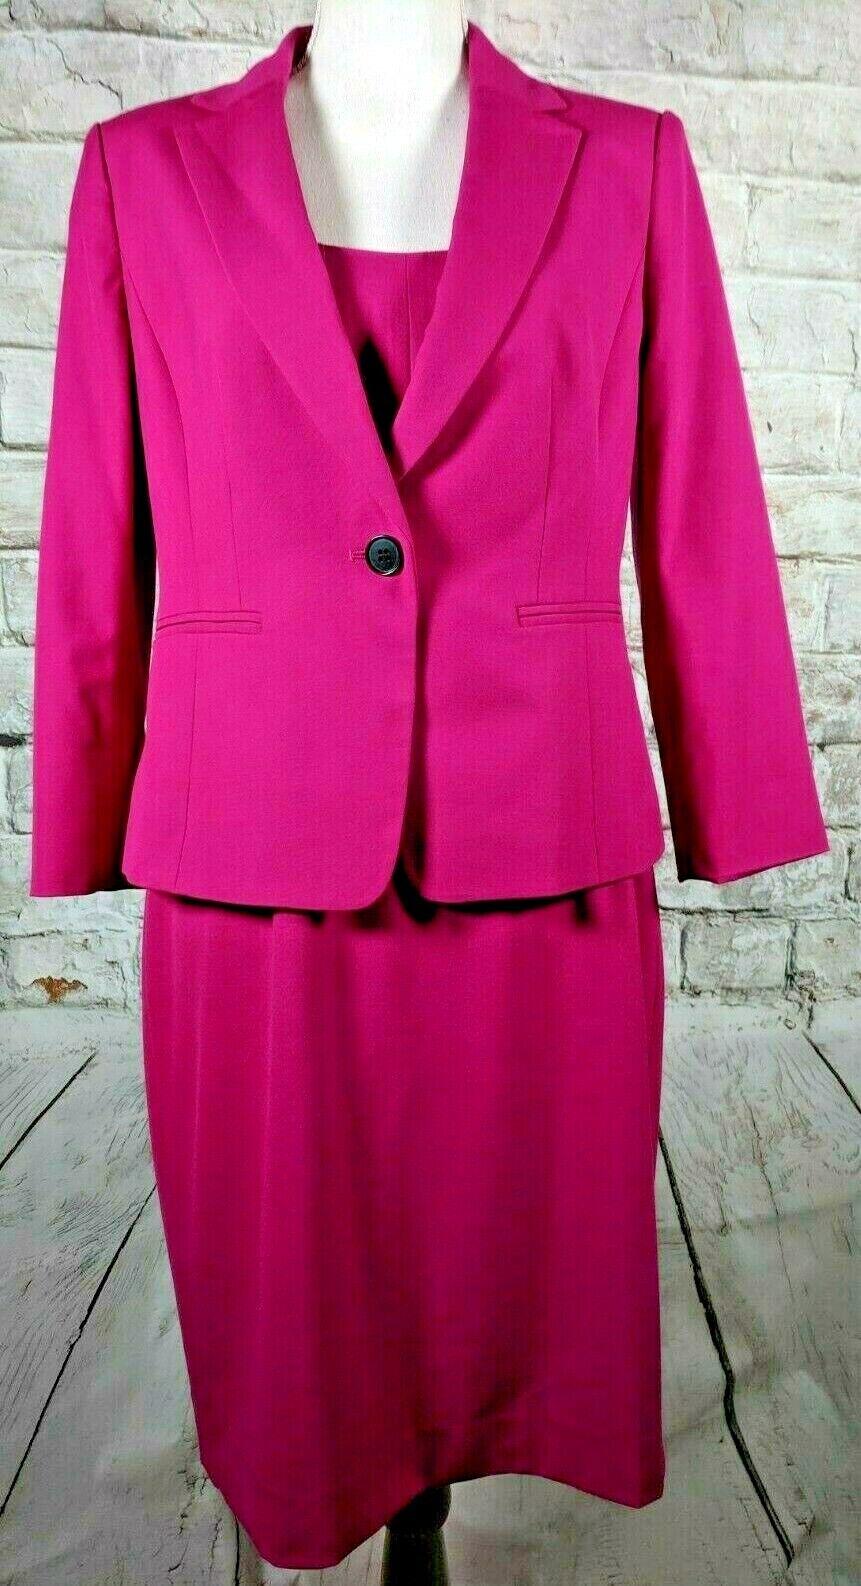 Vestido Tubo Sin Mangas Ann Taylor Traje Traje Traje Un Botón Abrigo Manga 3 4 rosado Oscuro 8 a339c8